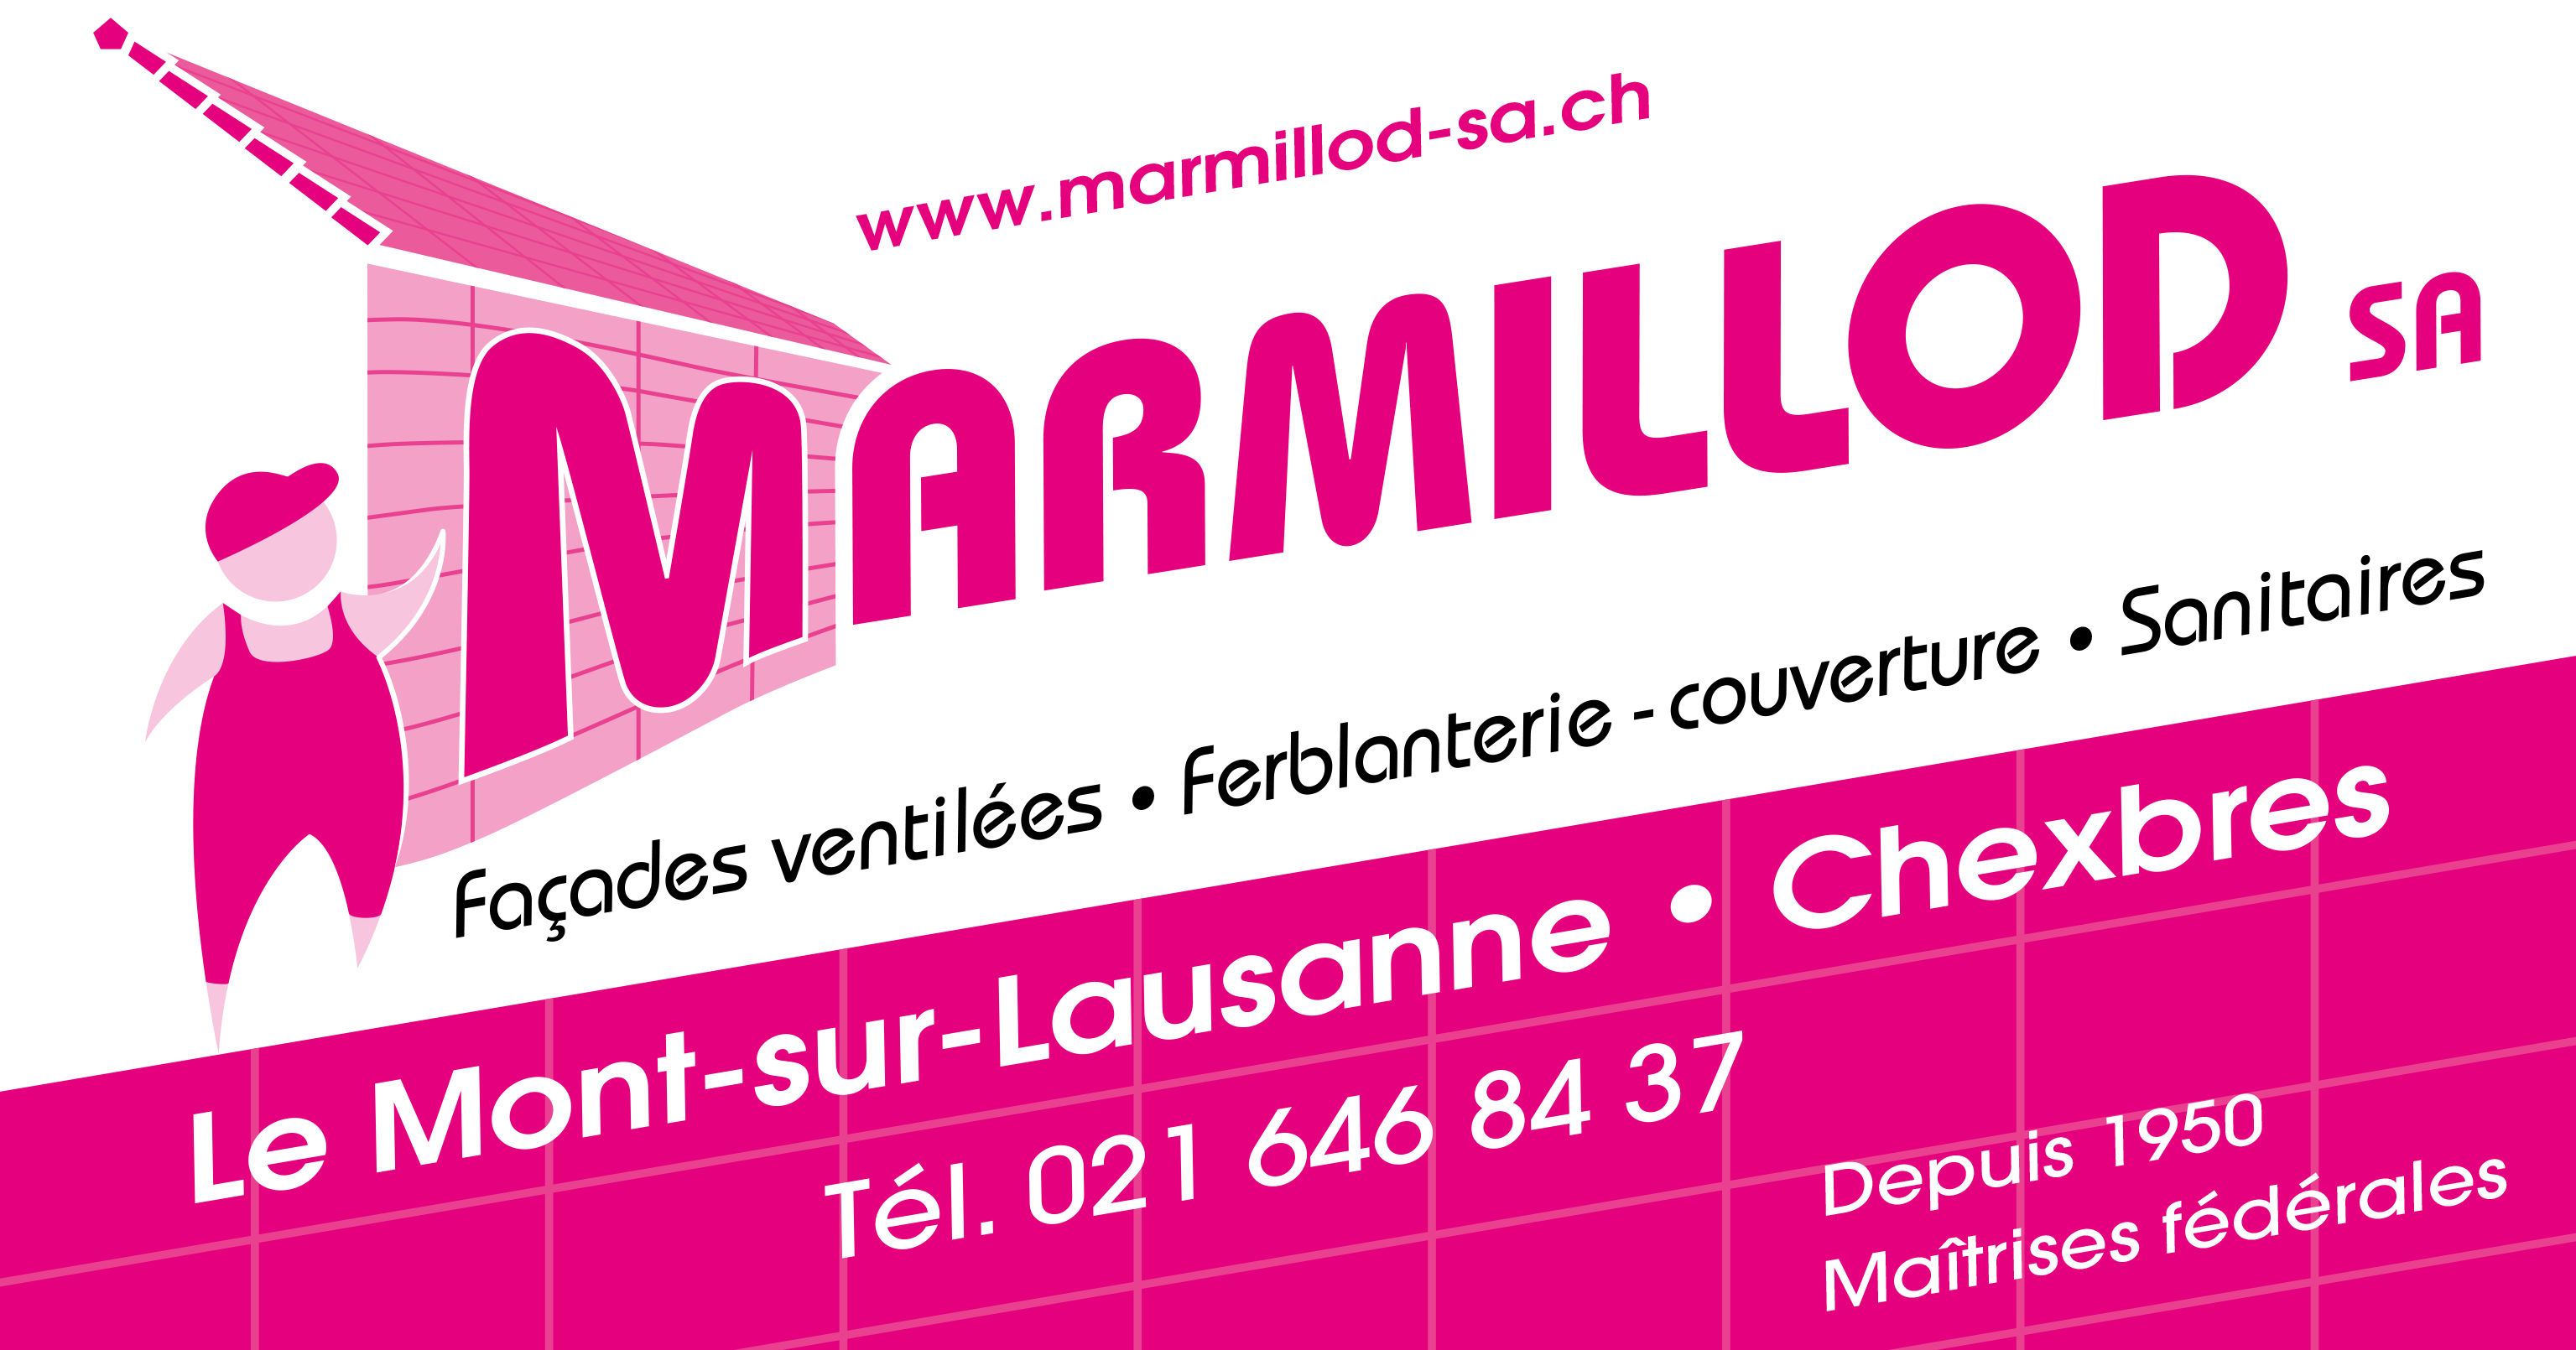 Marmillod